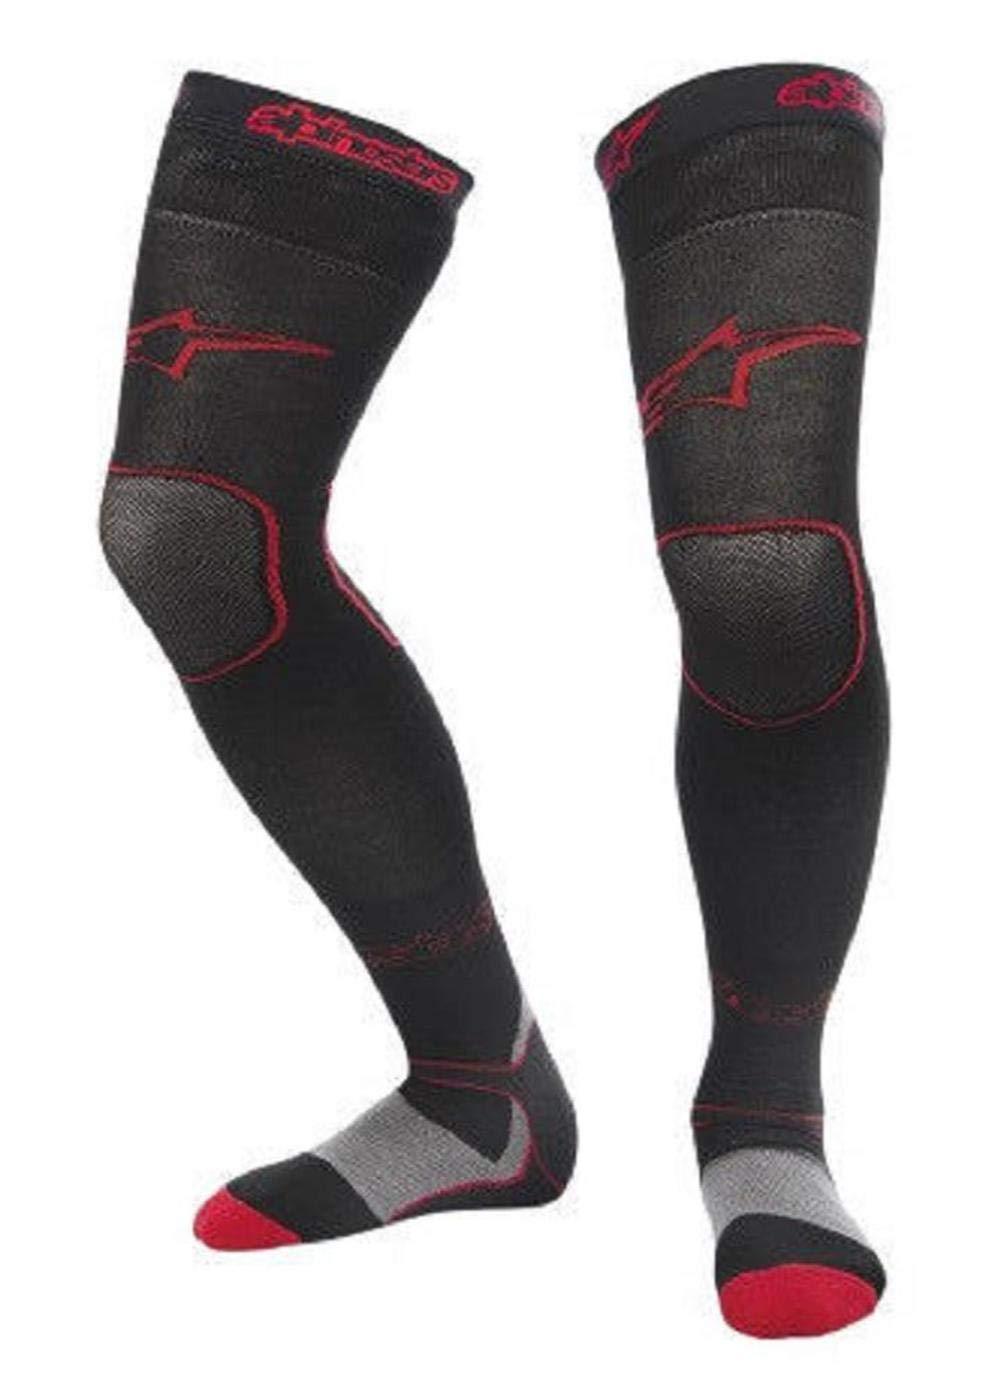 Alpinestars Long MX Socks, Distinct Name: Red, Primary Color: Red, Size: Lg-2XL, Gender: Mens/Unisex